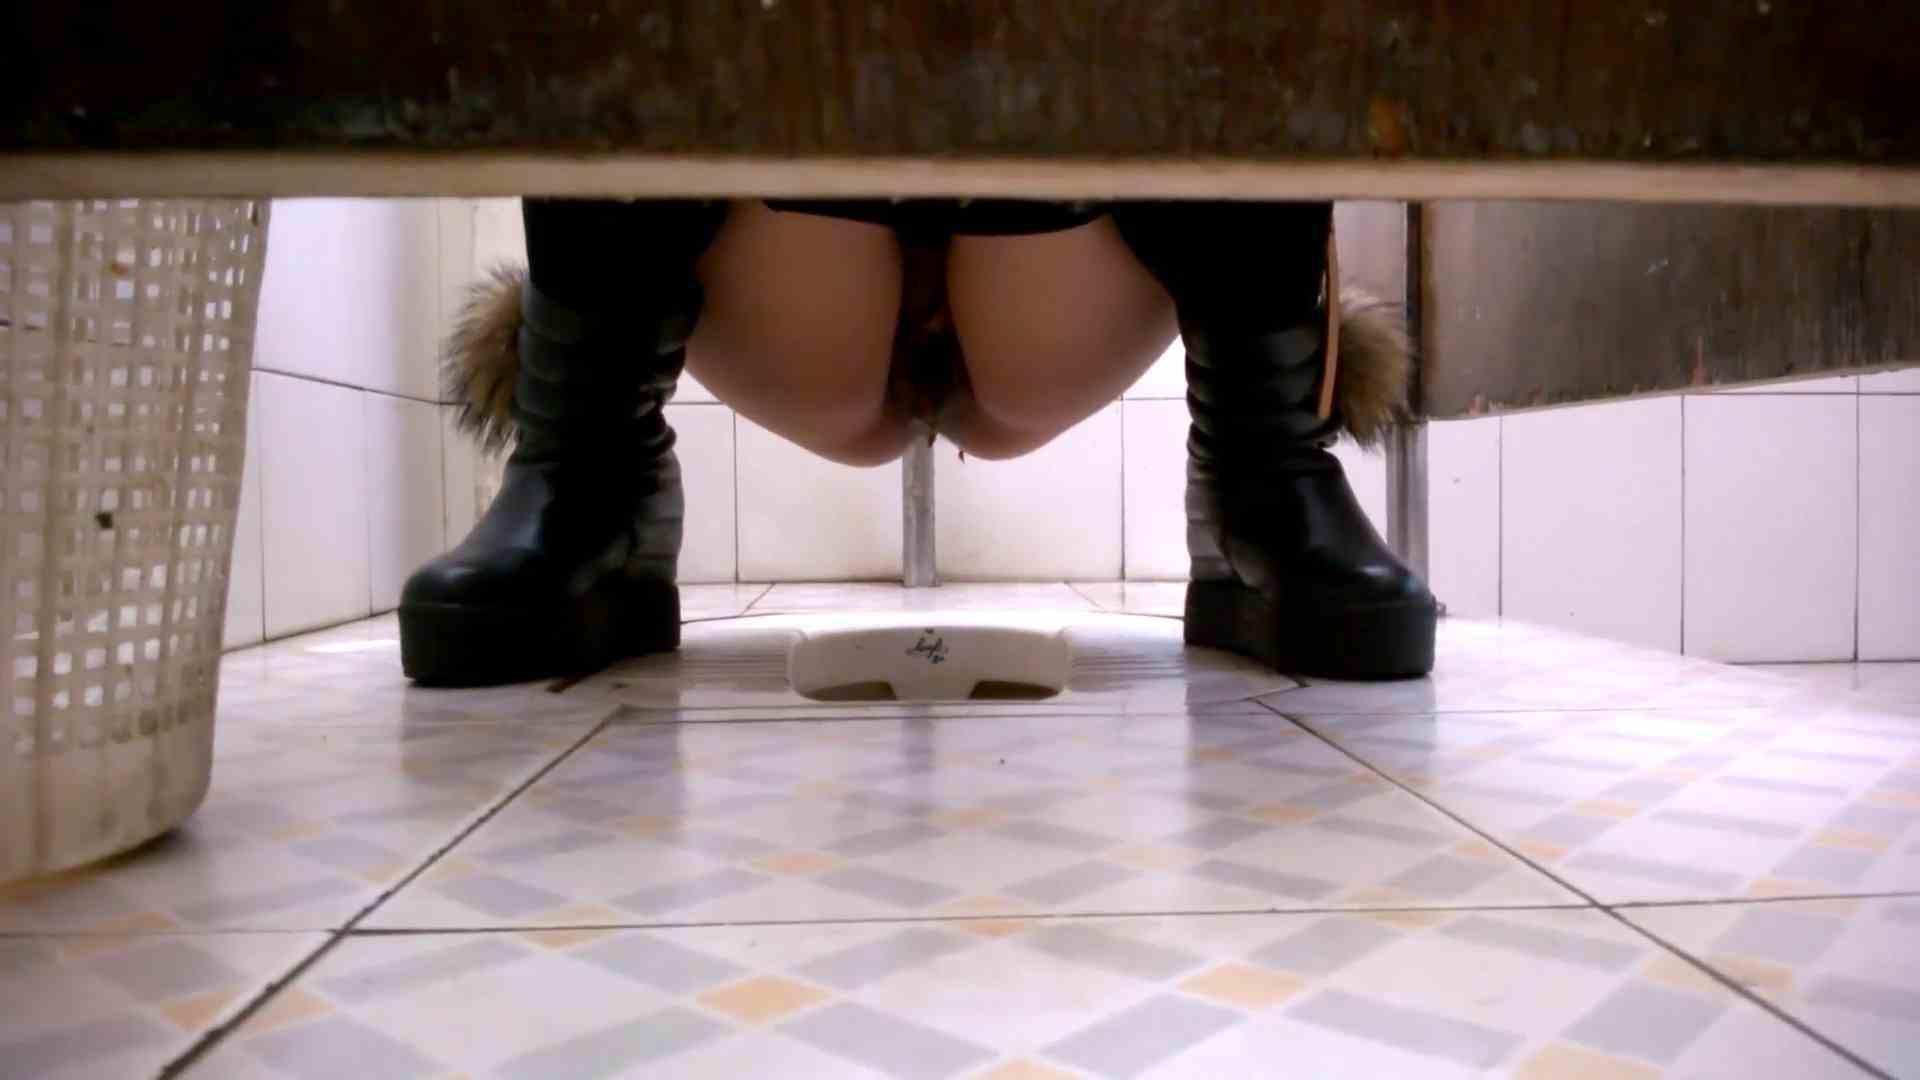 JD盗撮 美女の洗面所の秘密 Vol.34 トイレで・・・  98画像 48